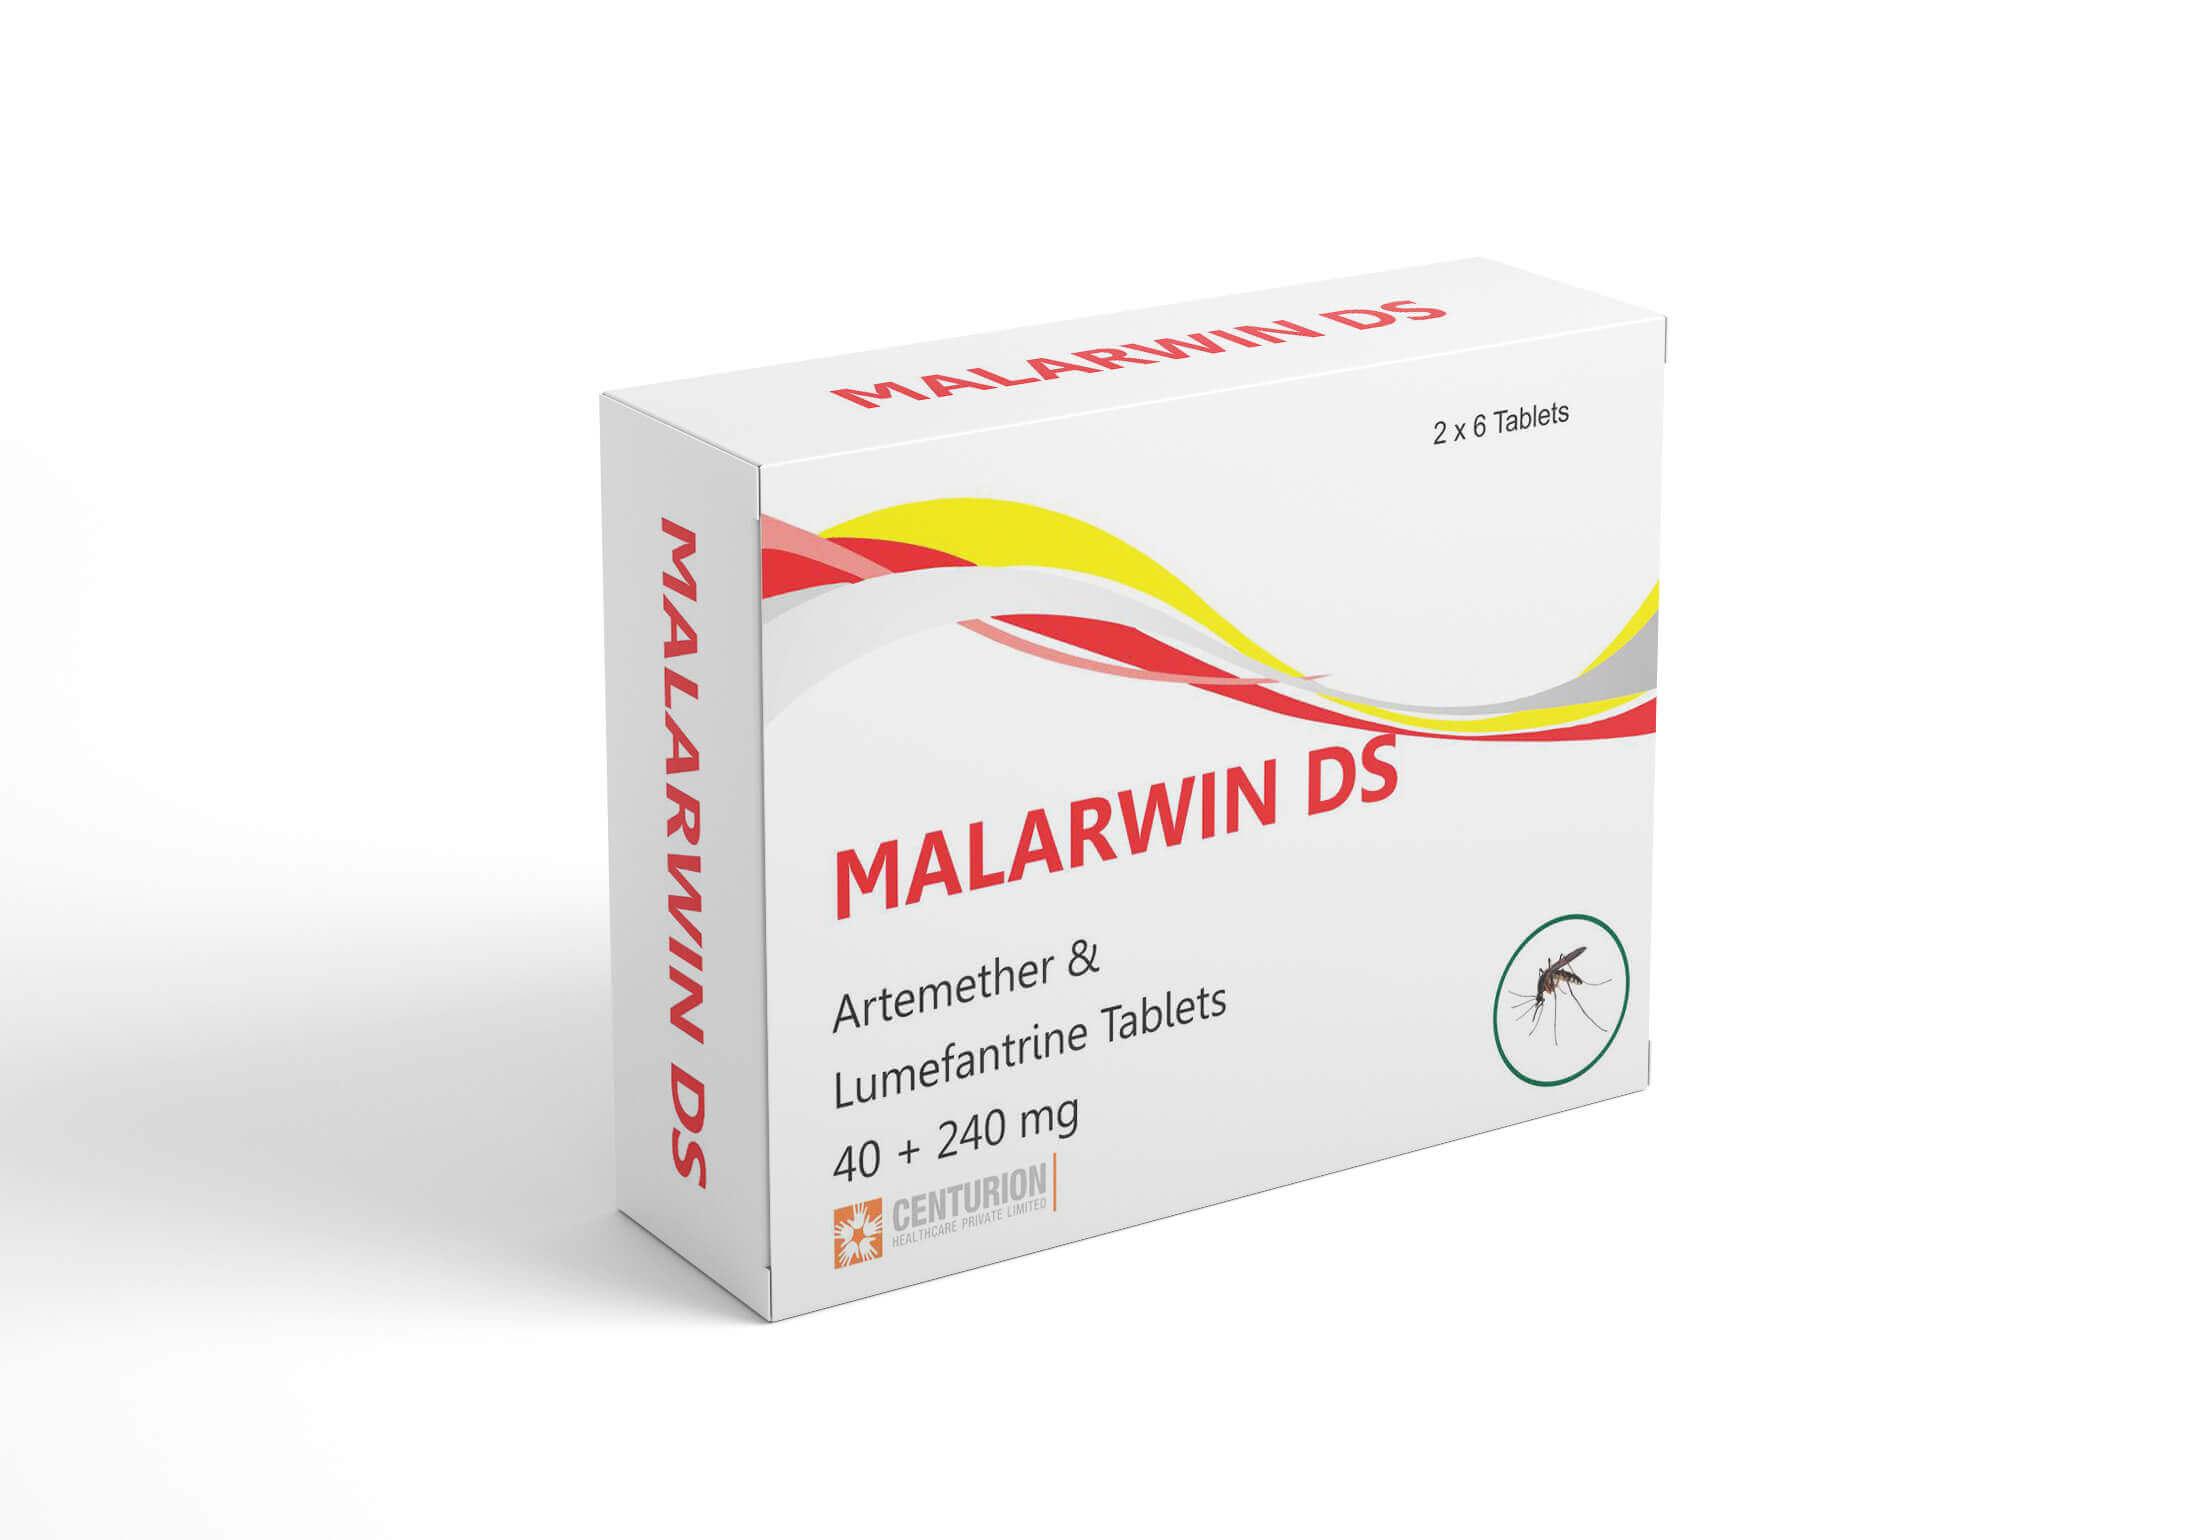 Artemether Lumefantrine Tablets 40 240 mg